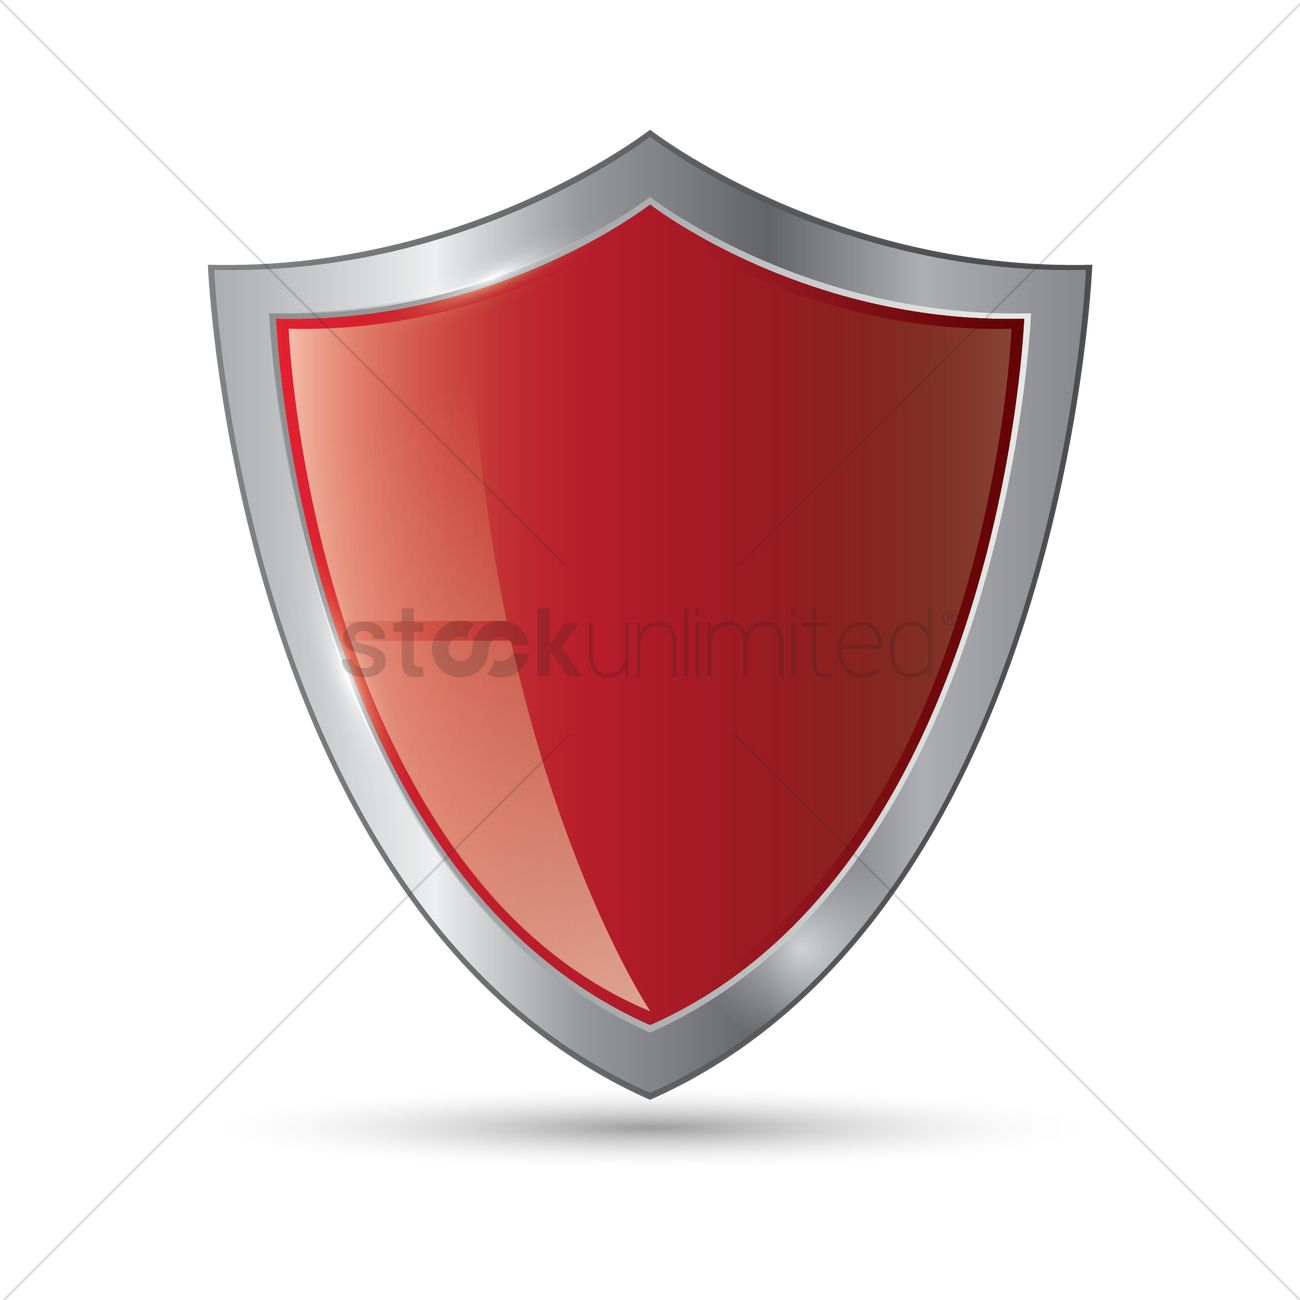 Shield emblem vector image 1873835 stockunlimited shield emblem vector graphic buycottarizona Image collections